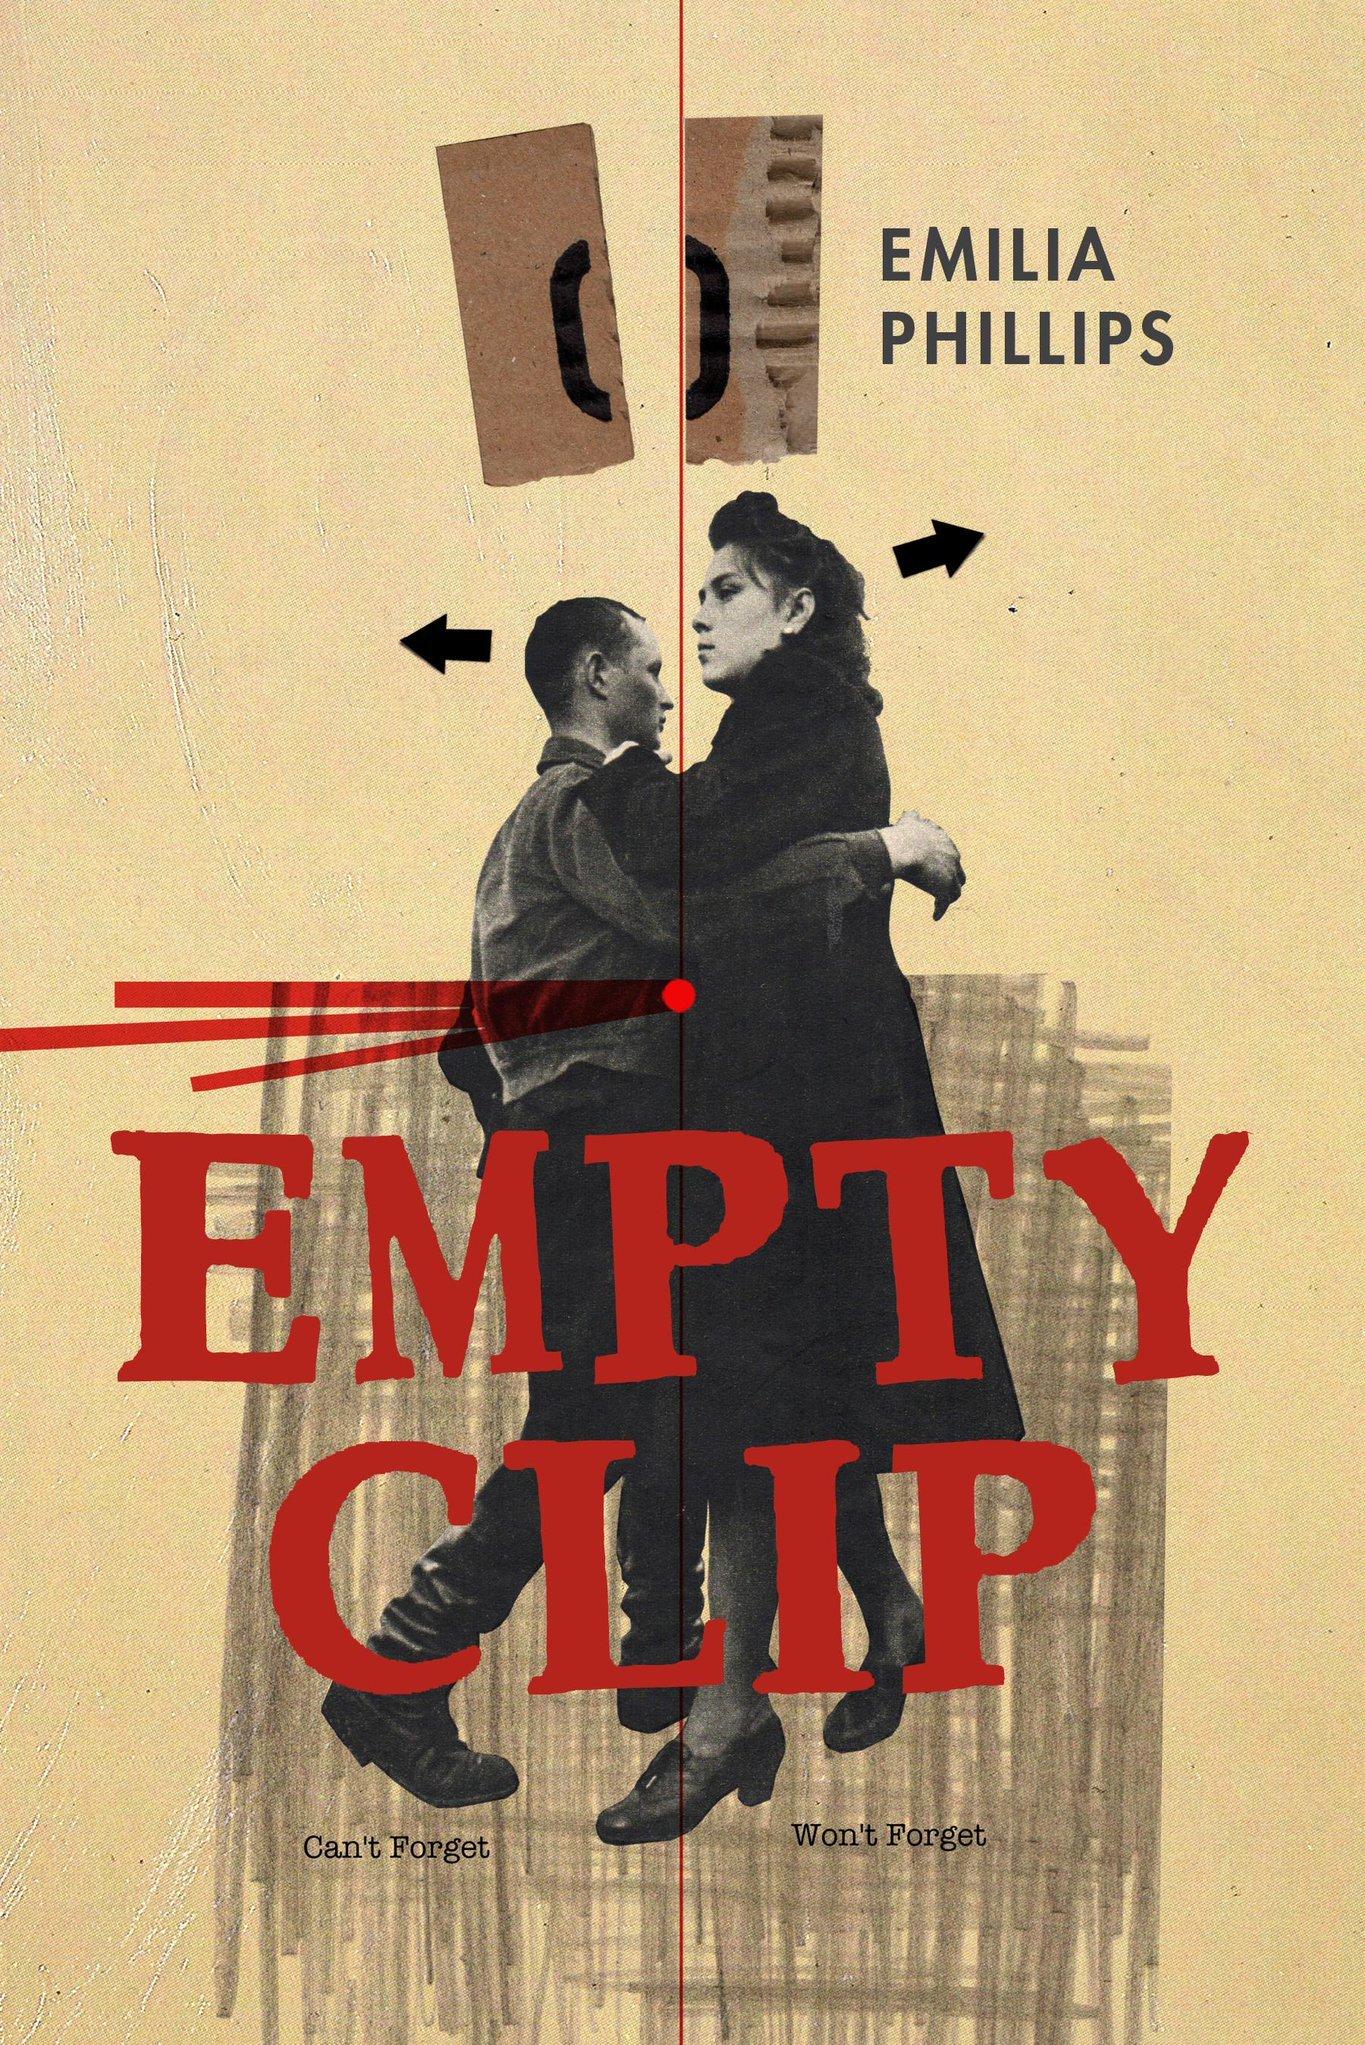 Empty Clip by Emilia Phillips cover art, University of Akron Press, 2018